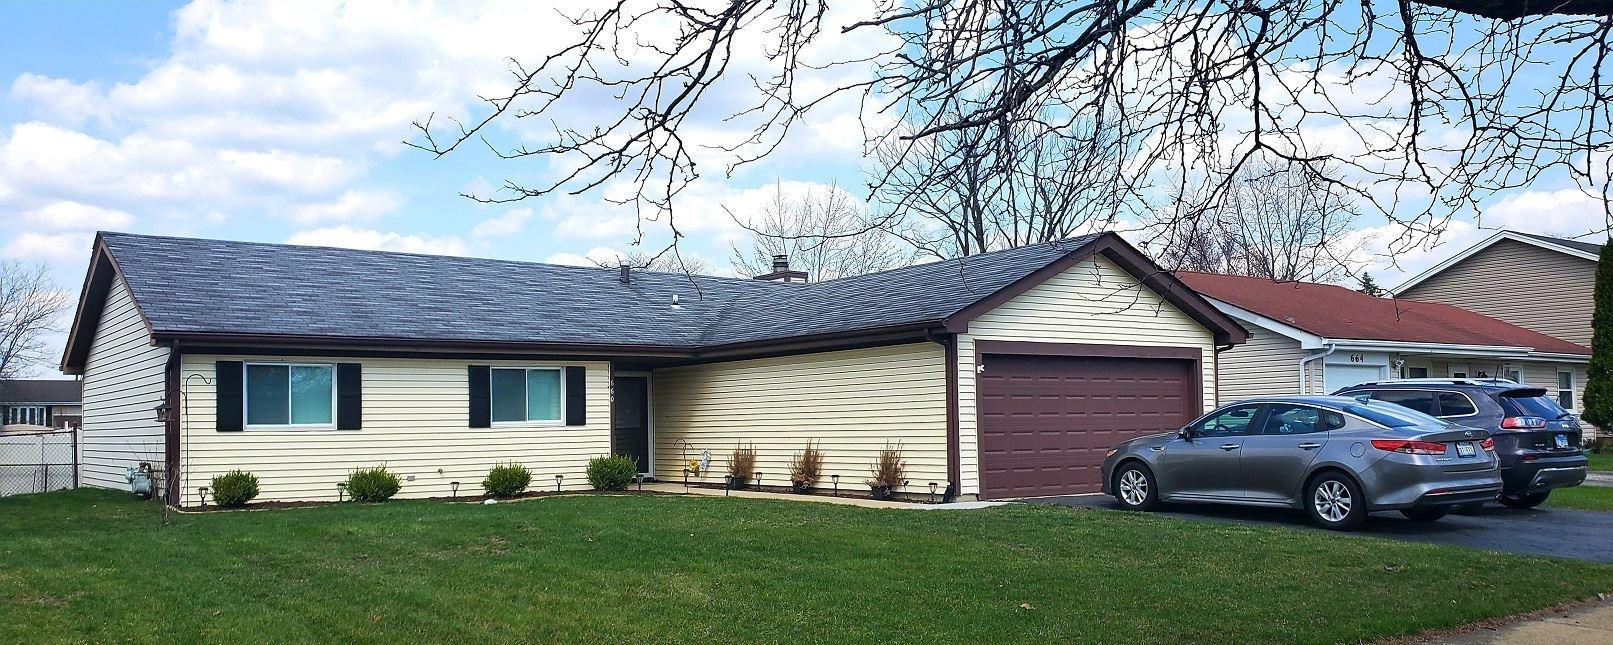 660 Niagara Drive, Bolingbrook, IL 60440 - #: 11050932